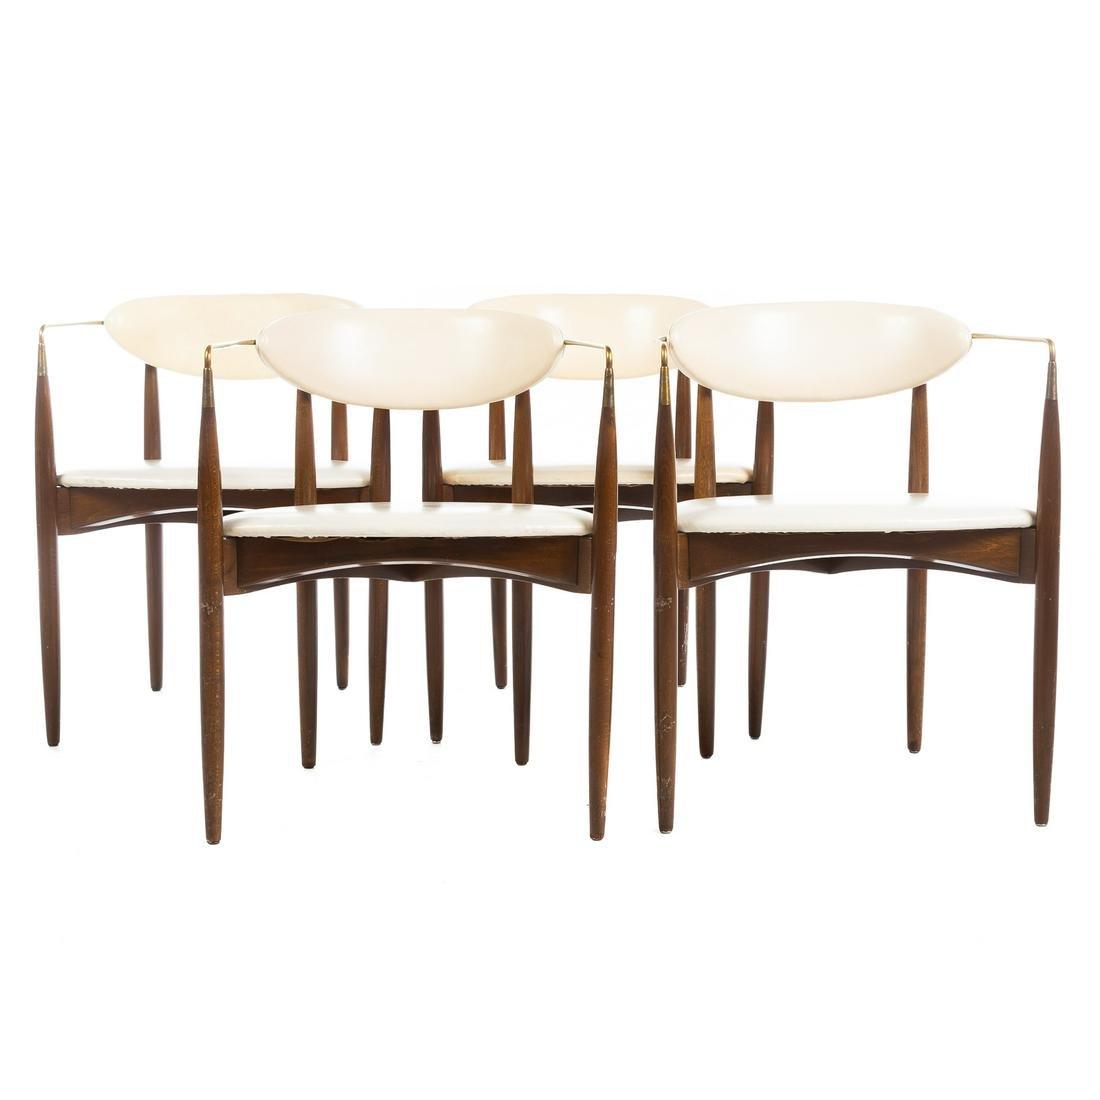 Four Mid-century Modern White Naugahyde Chairs